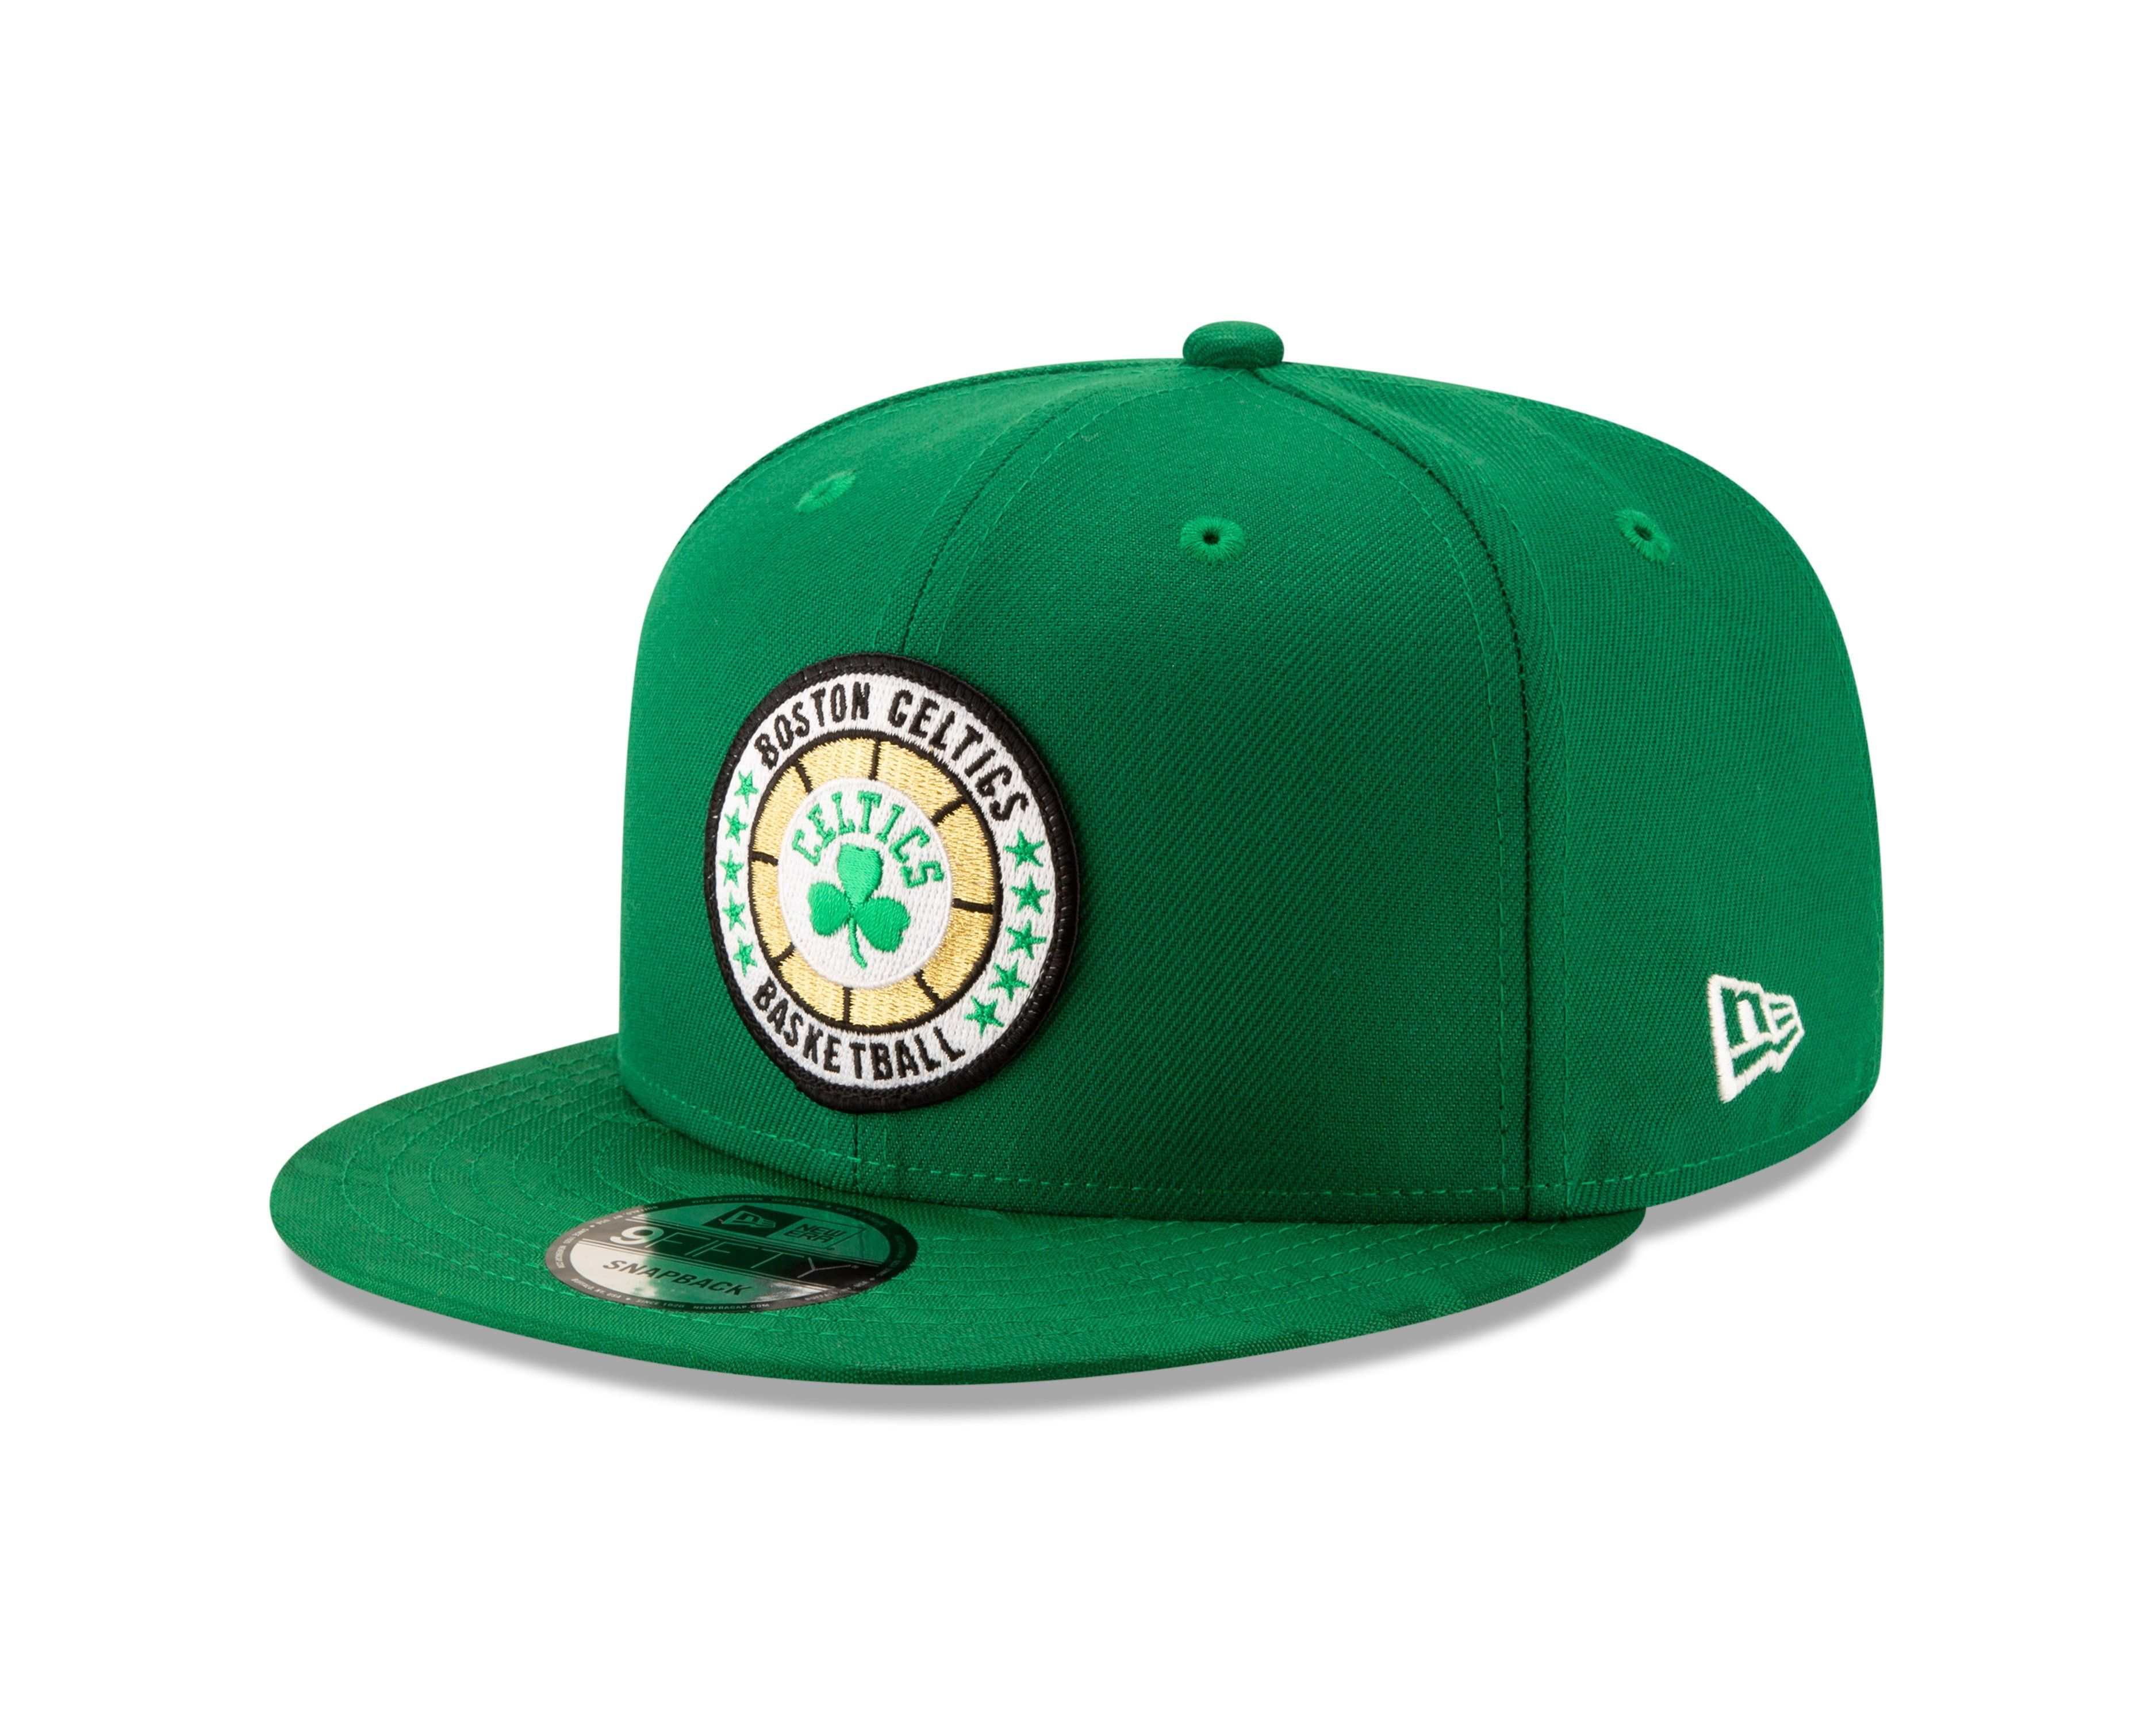 789d0294fda Men s Boston Celtics New Era Green 2018 Tip-Off Series 9FIFTY Snapback Hat